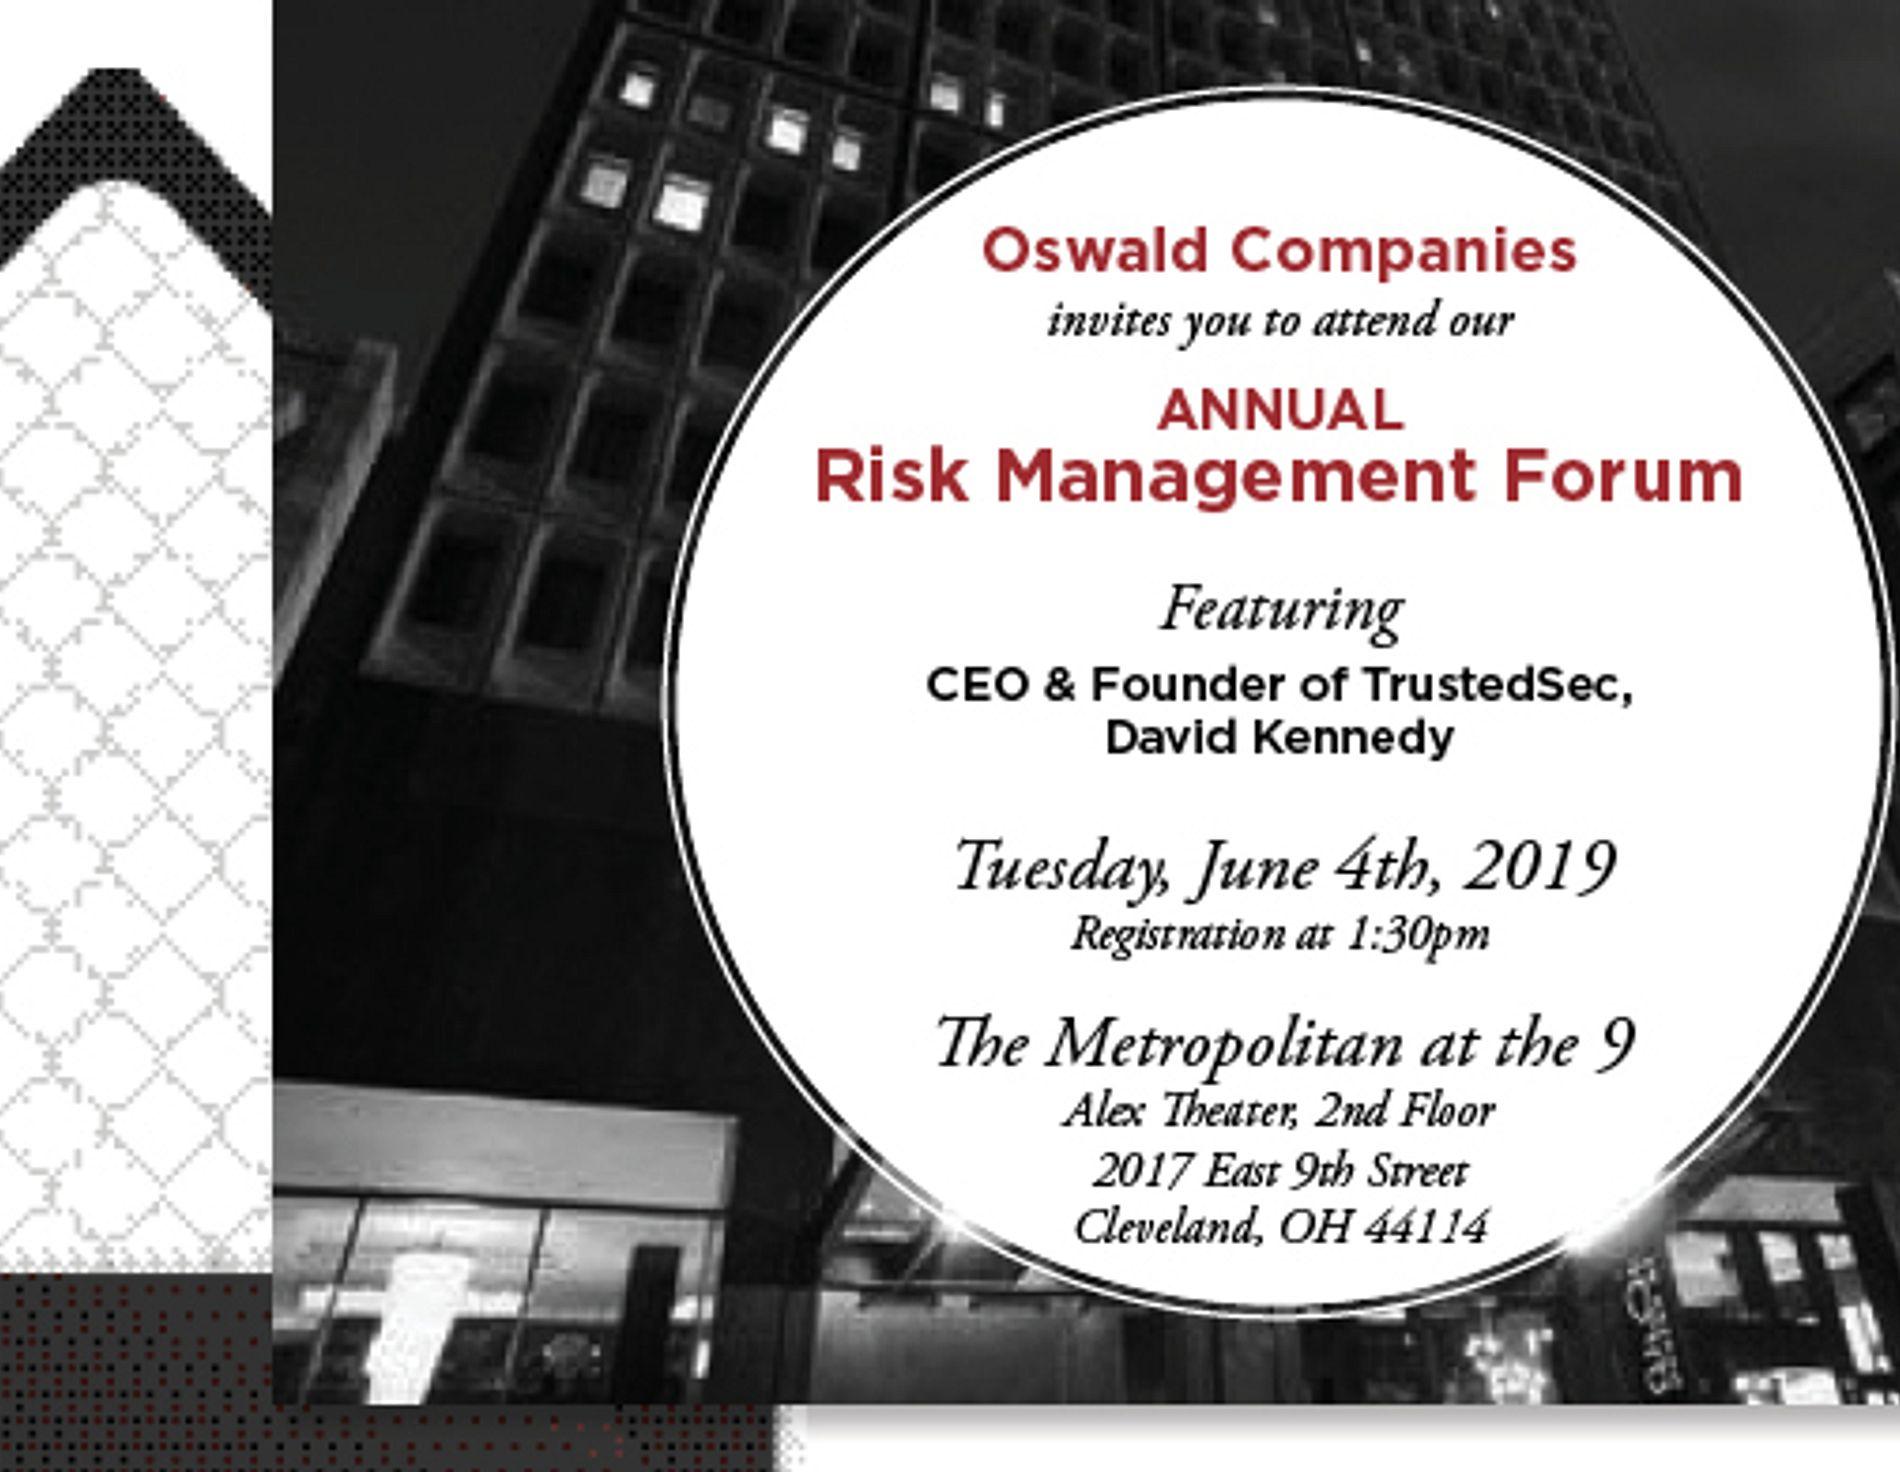 Risk Management Forum